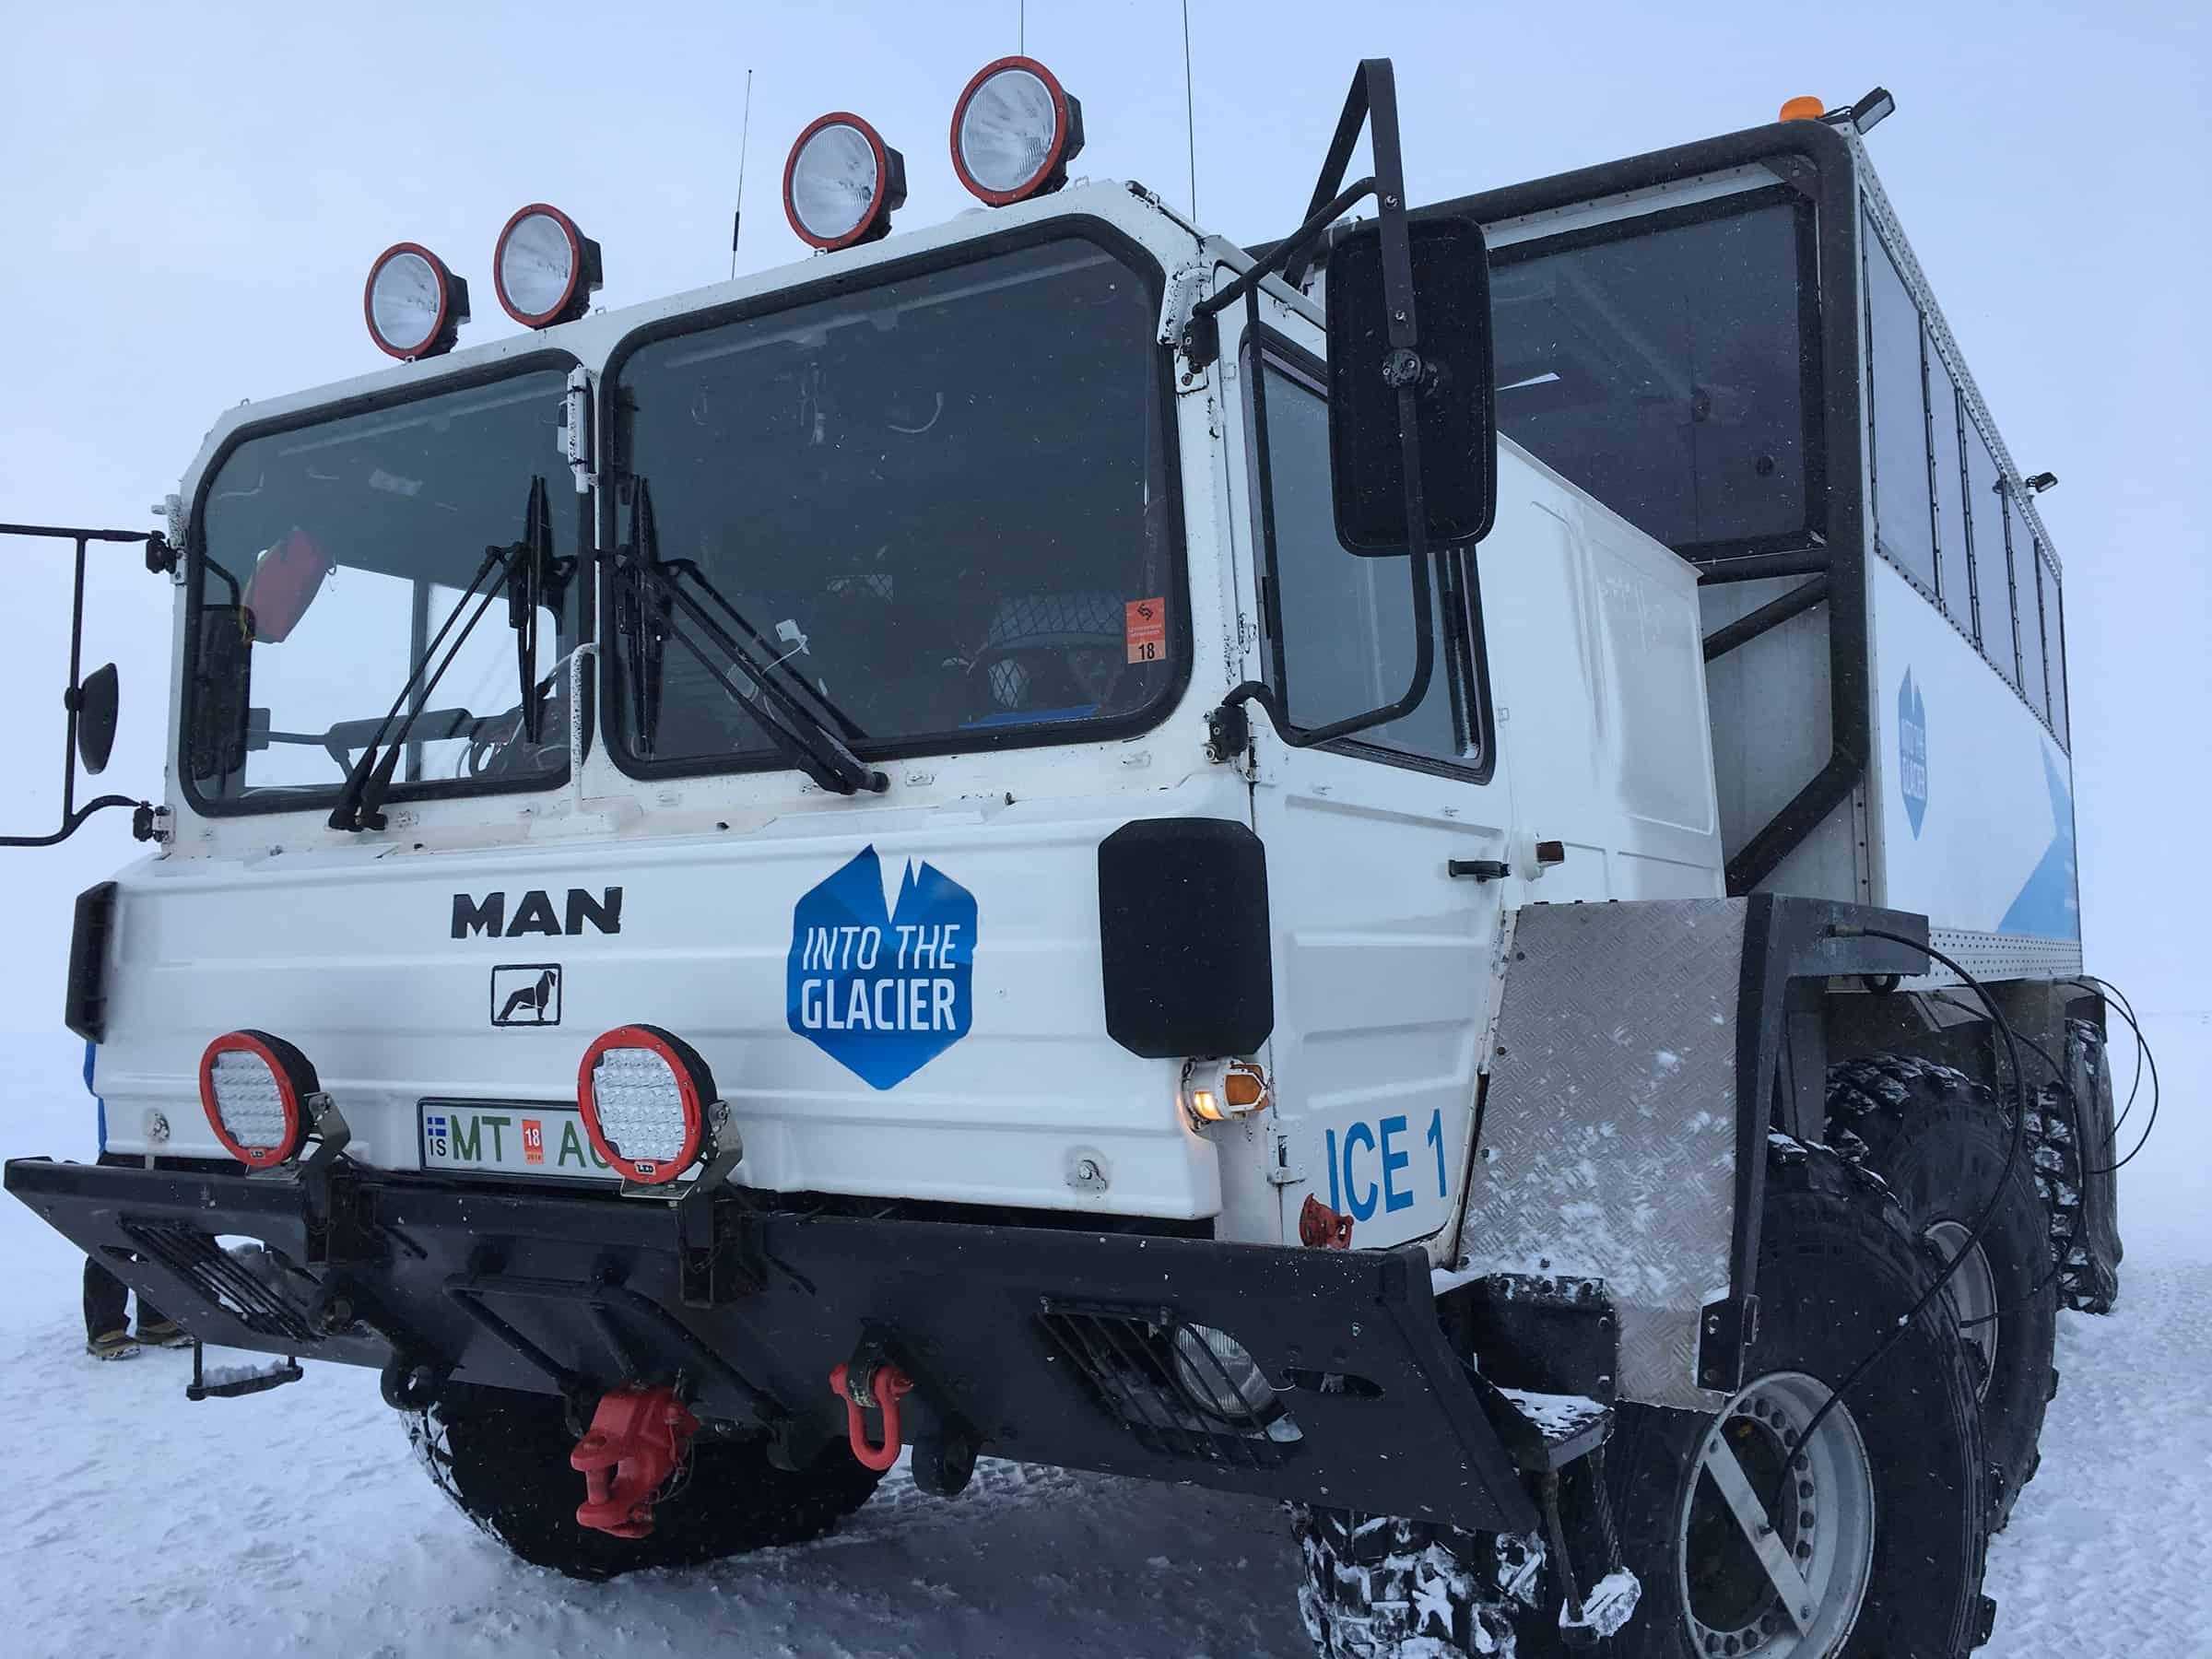 Met deze enorme wagens rij je naar de gletsjer